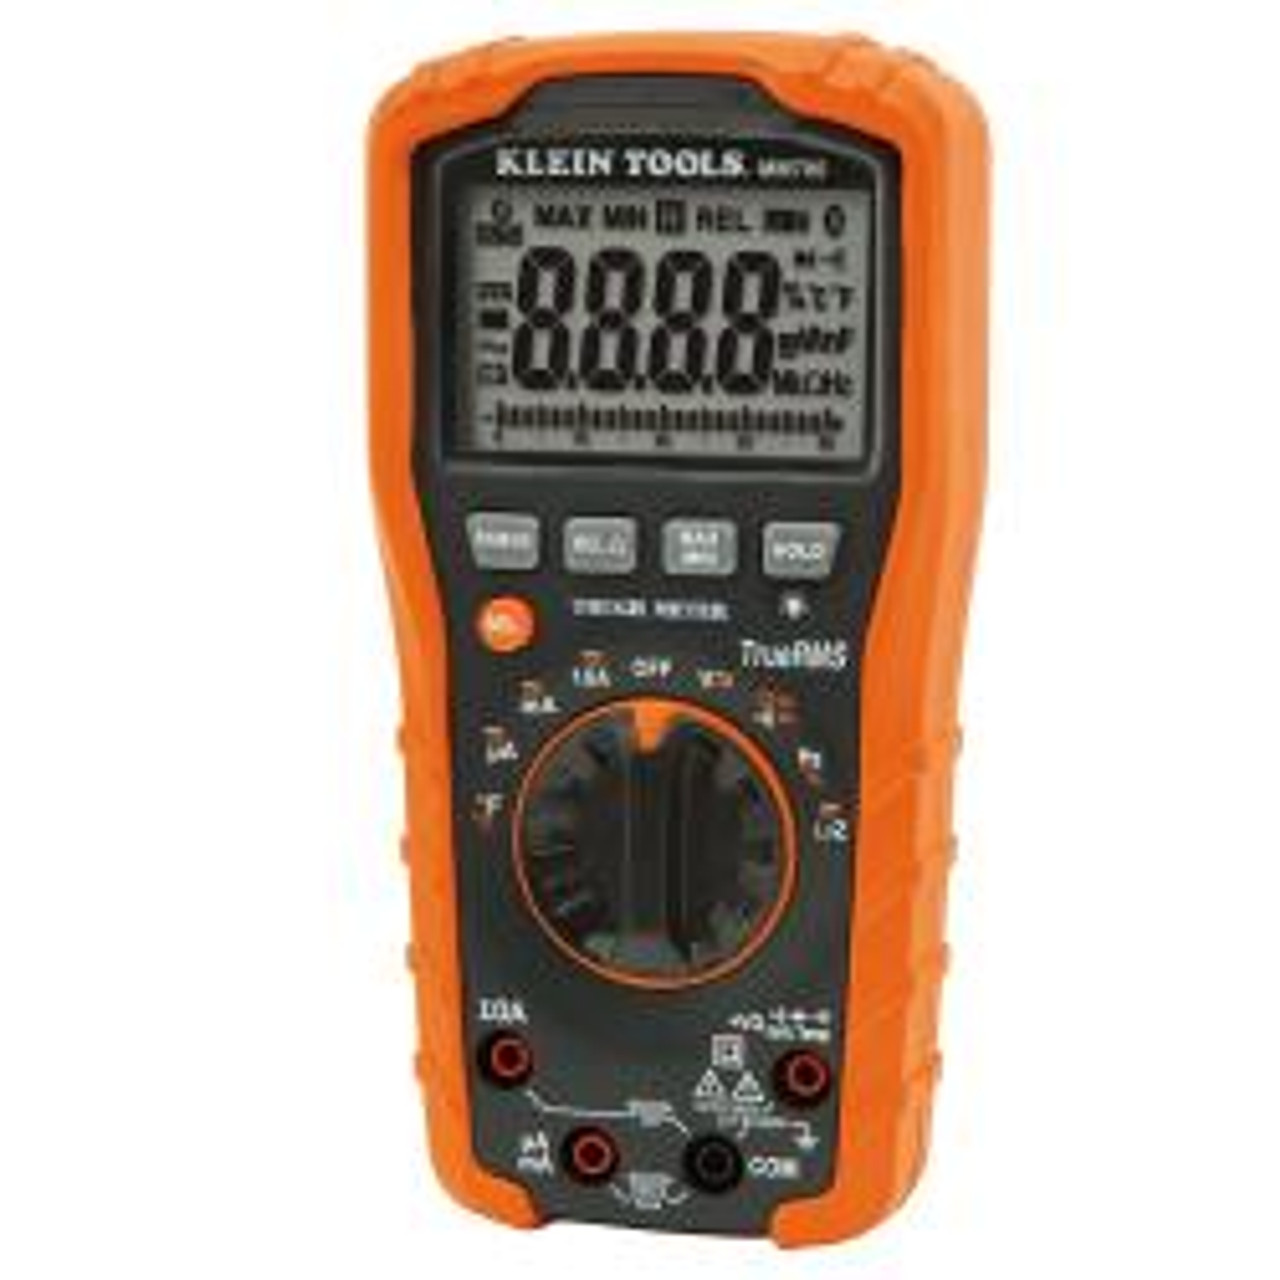 Klein MM700 Digital Multimeter TRMS/LOW Impedance